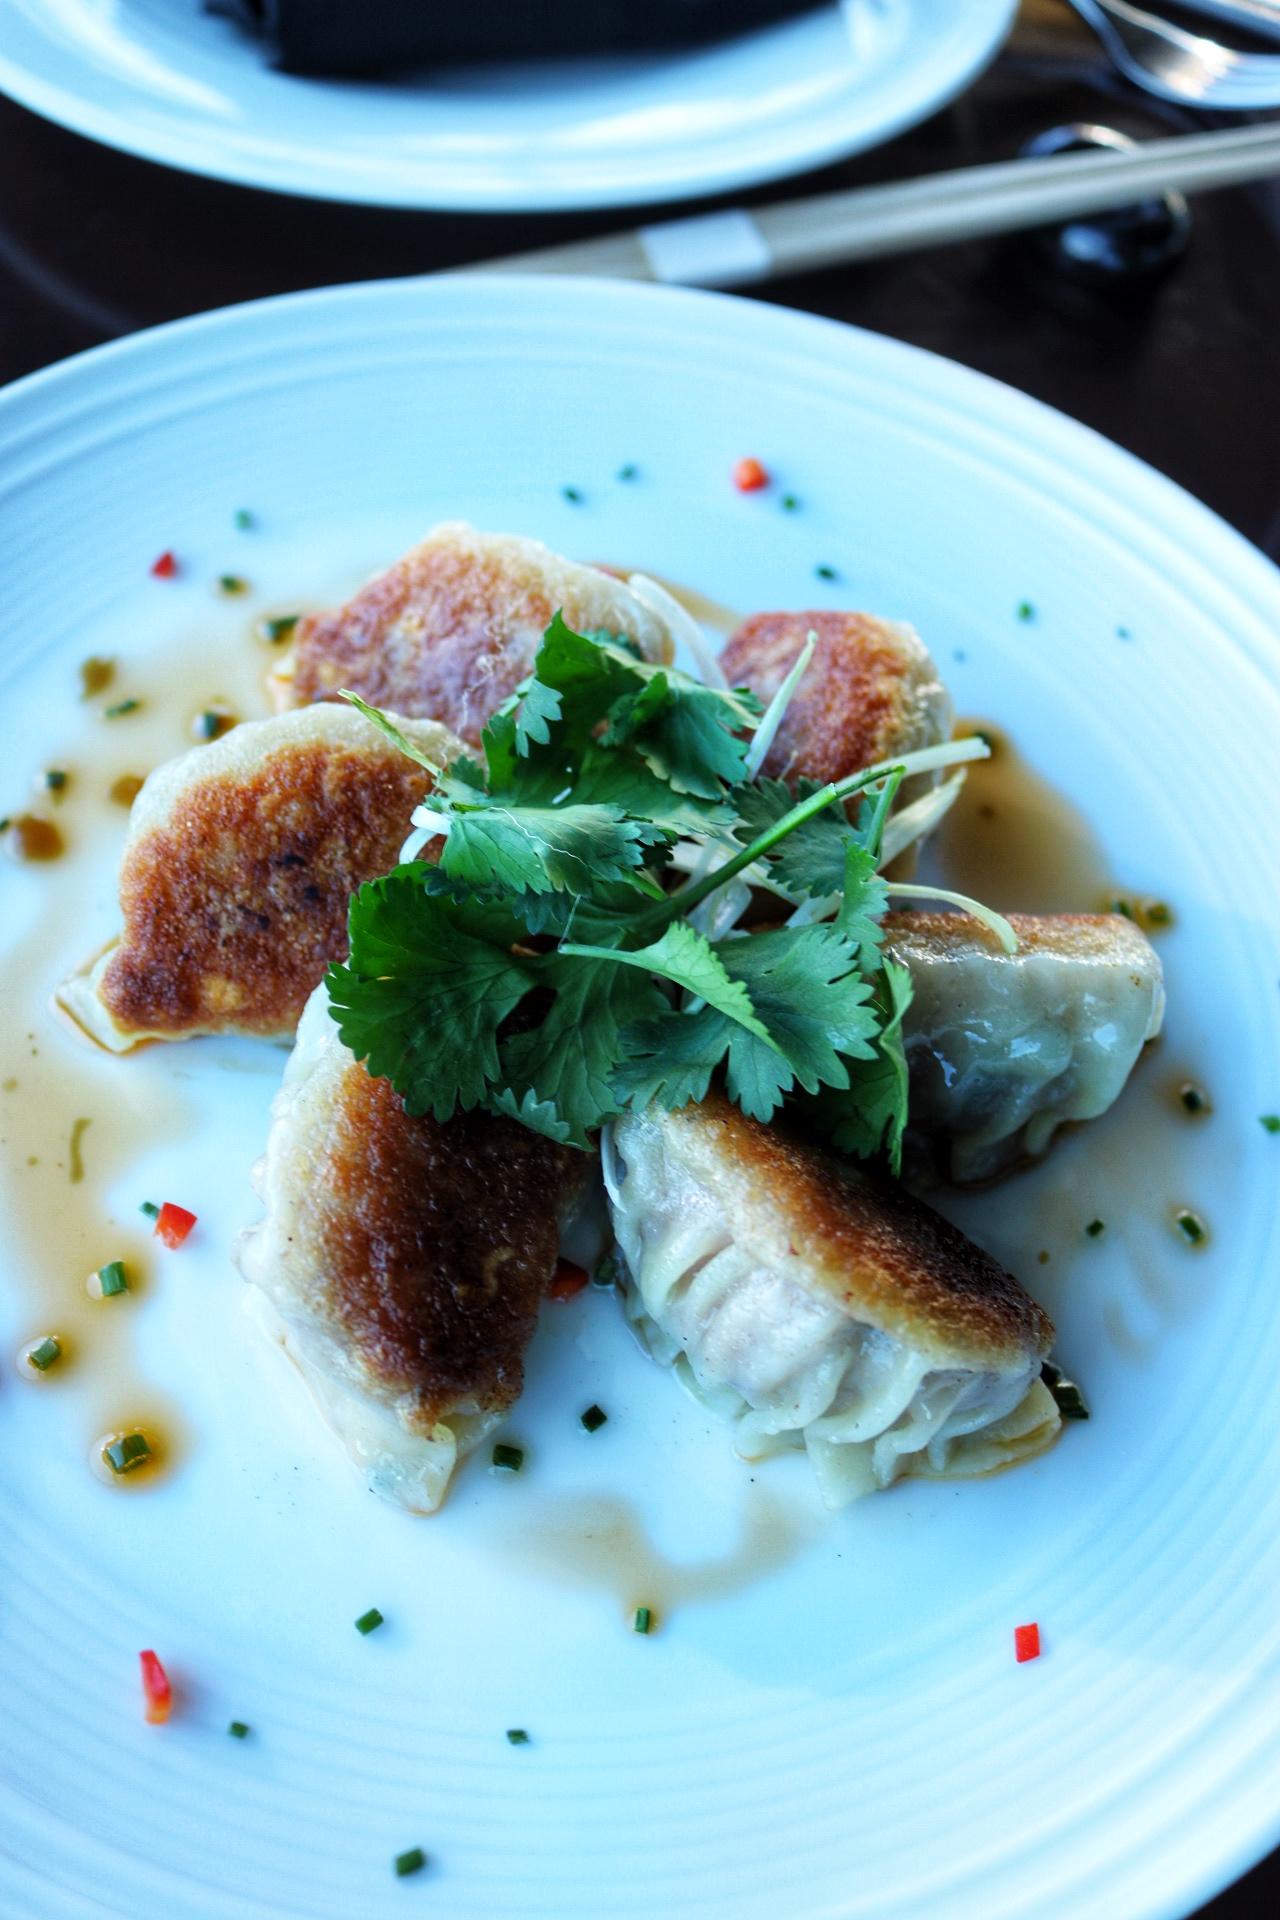 Nest @WP24 Ritz-Carlton - Dumplings